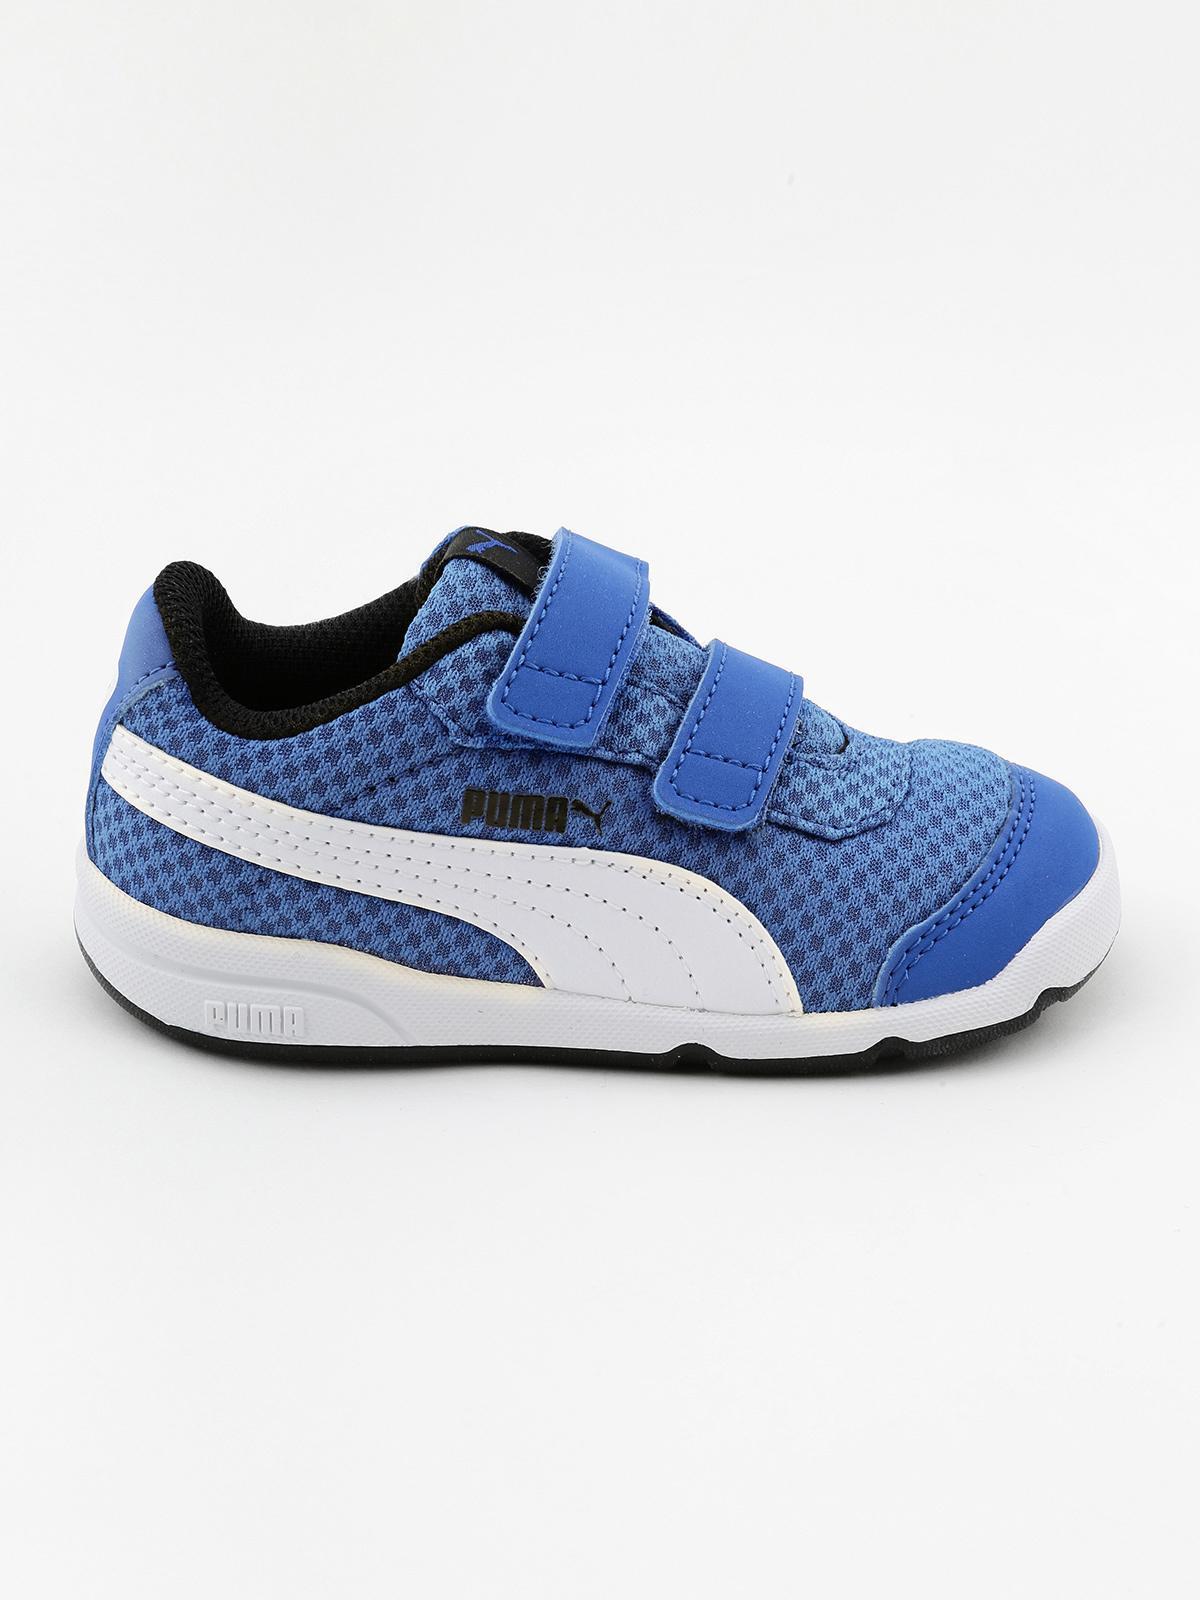 Scarpe sportive blu STEPFLEEX 2 MESH V INF puma | MecShopping